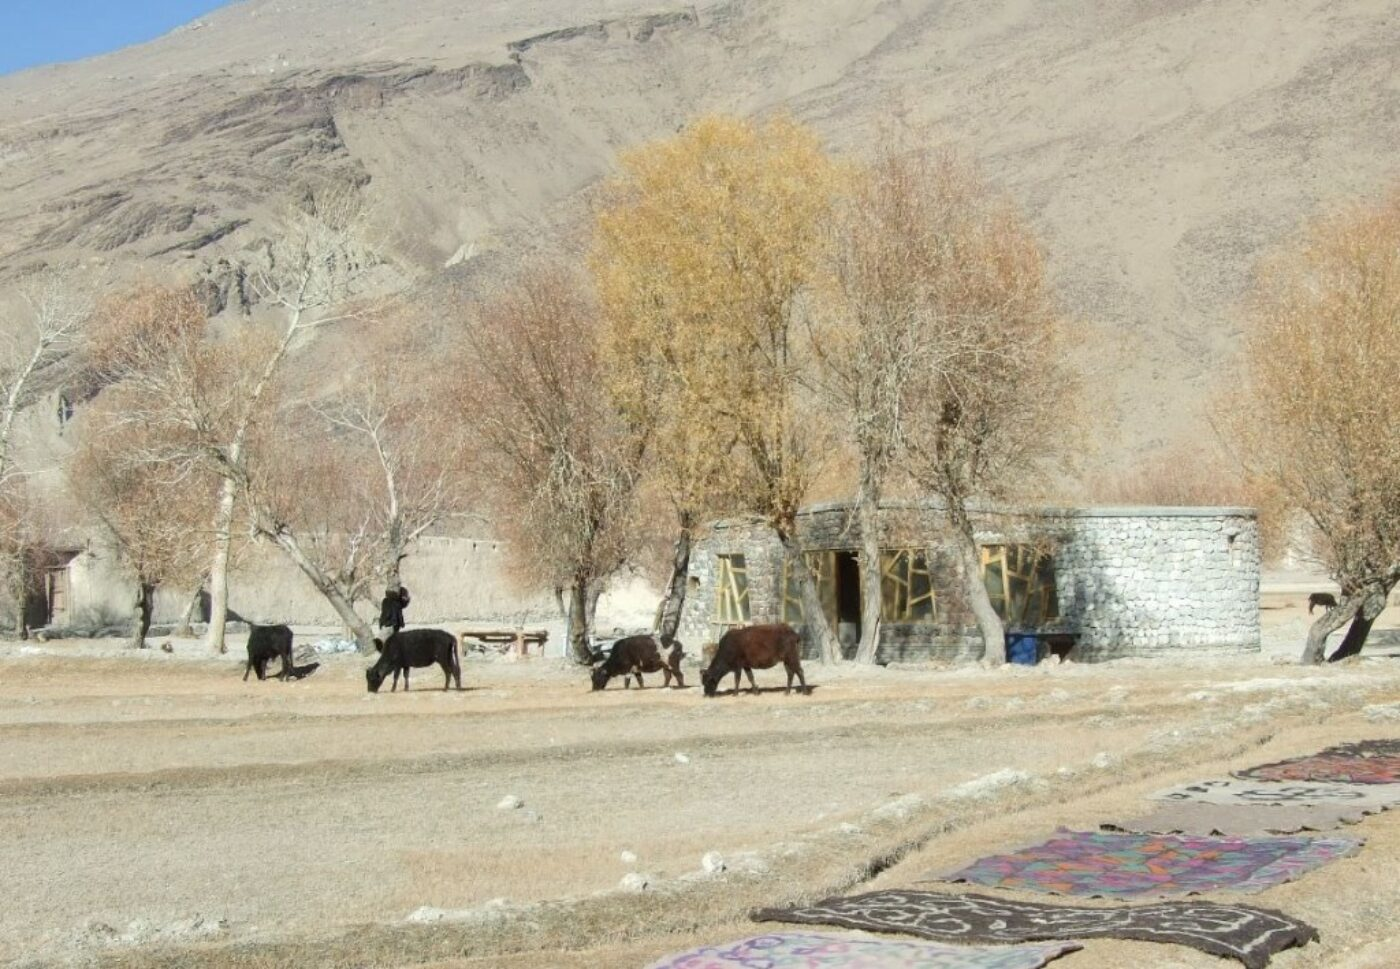 AFGHANISTAN: Visitors Centre in Pamir-i-Buzurg Wildlife Reserve